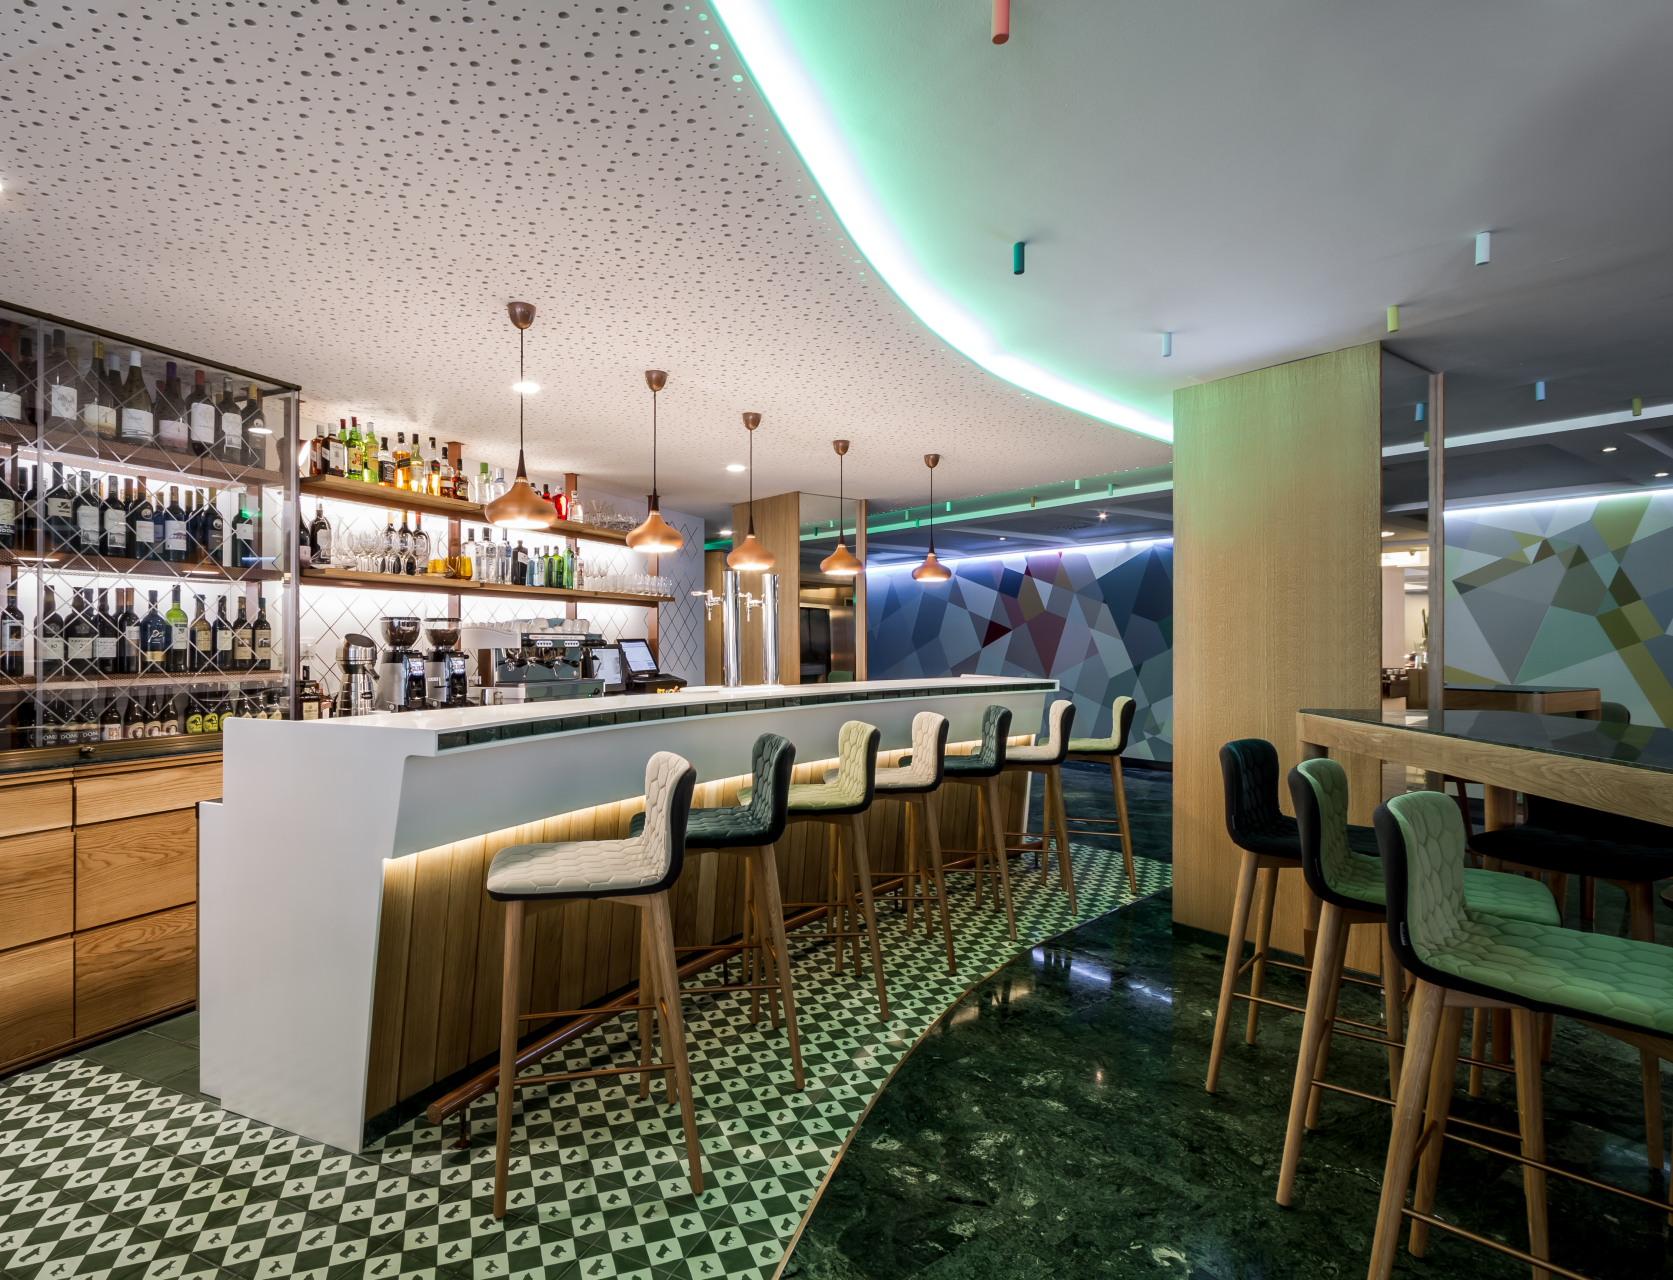 fotografia-arquitectura-valencia-german-cabo-estudihac-poncelet-cheese-bar-barcelona (21)